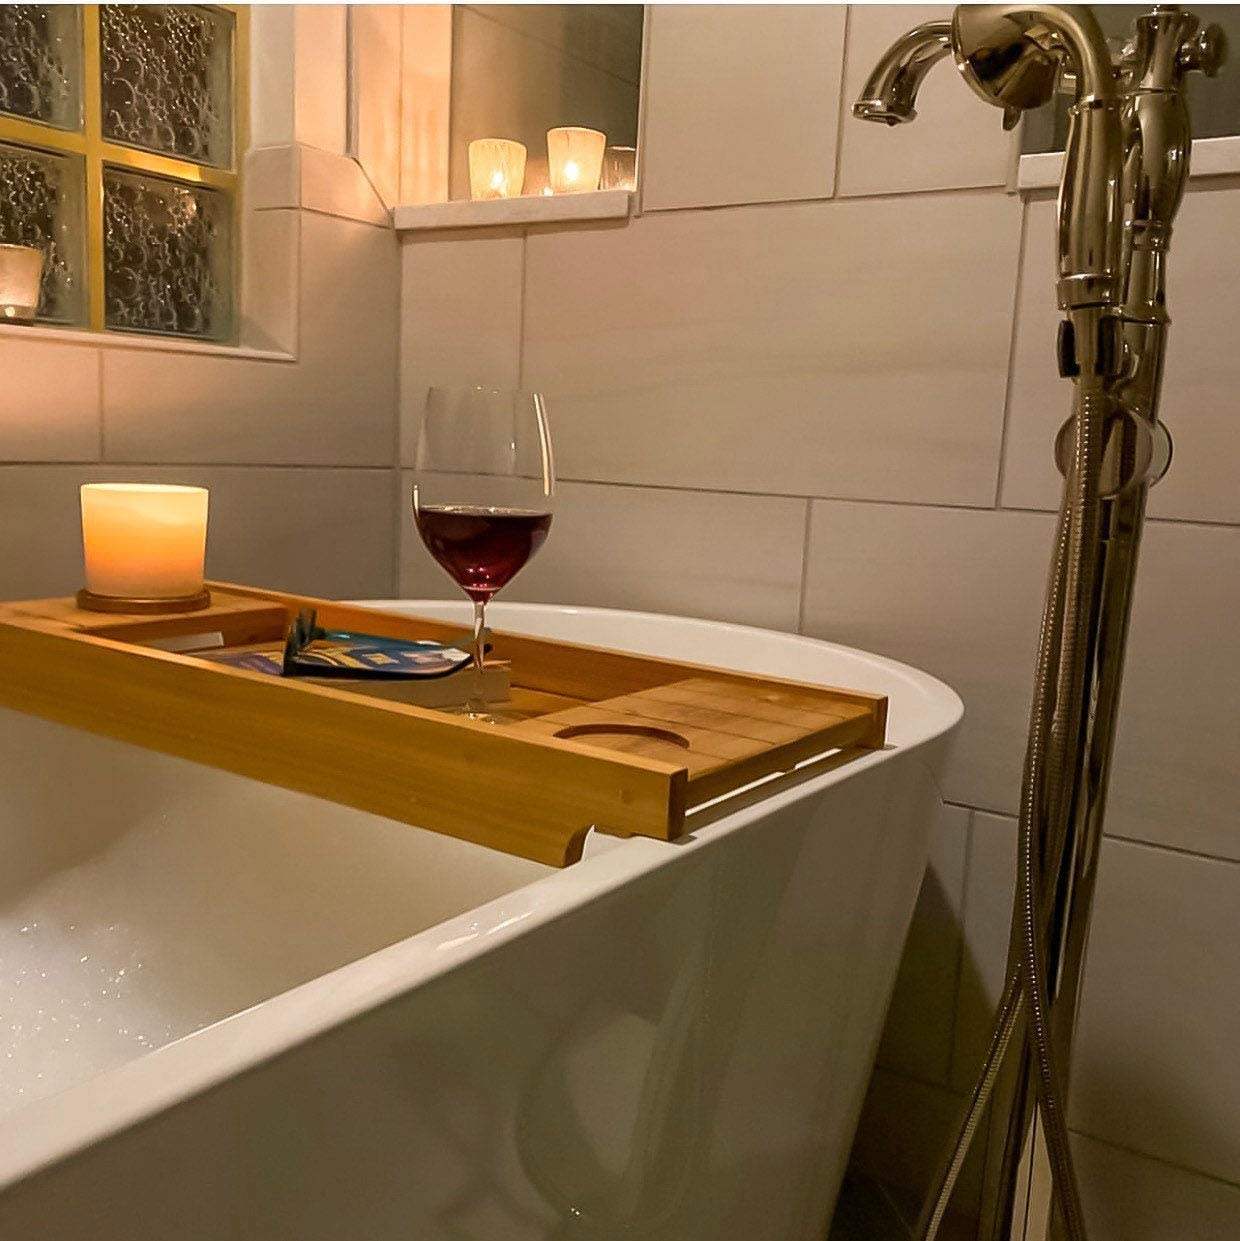 Natural Bathtub Caddy Tray Rustic Wooden Bath Caddy for Wine Holder Shampoo Razors Towel by STYLE Rustic Wood